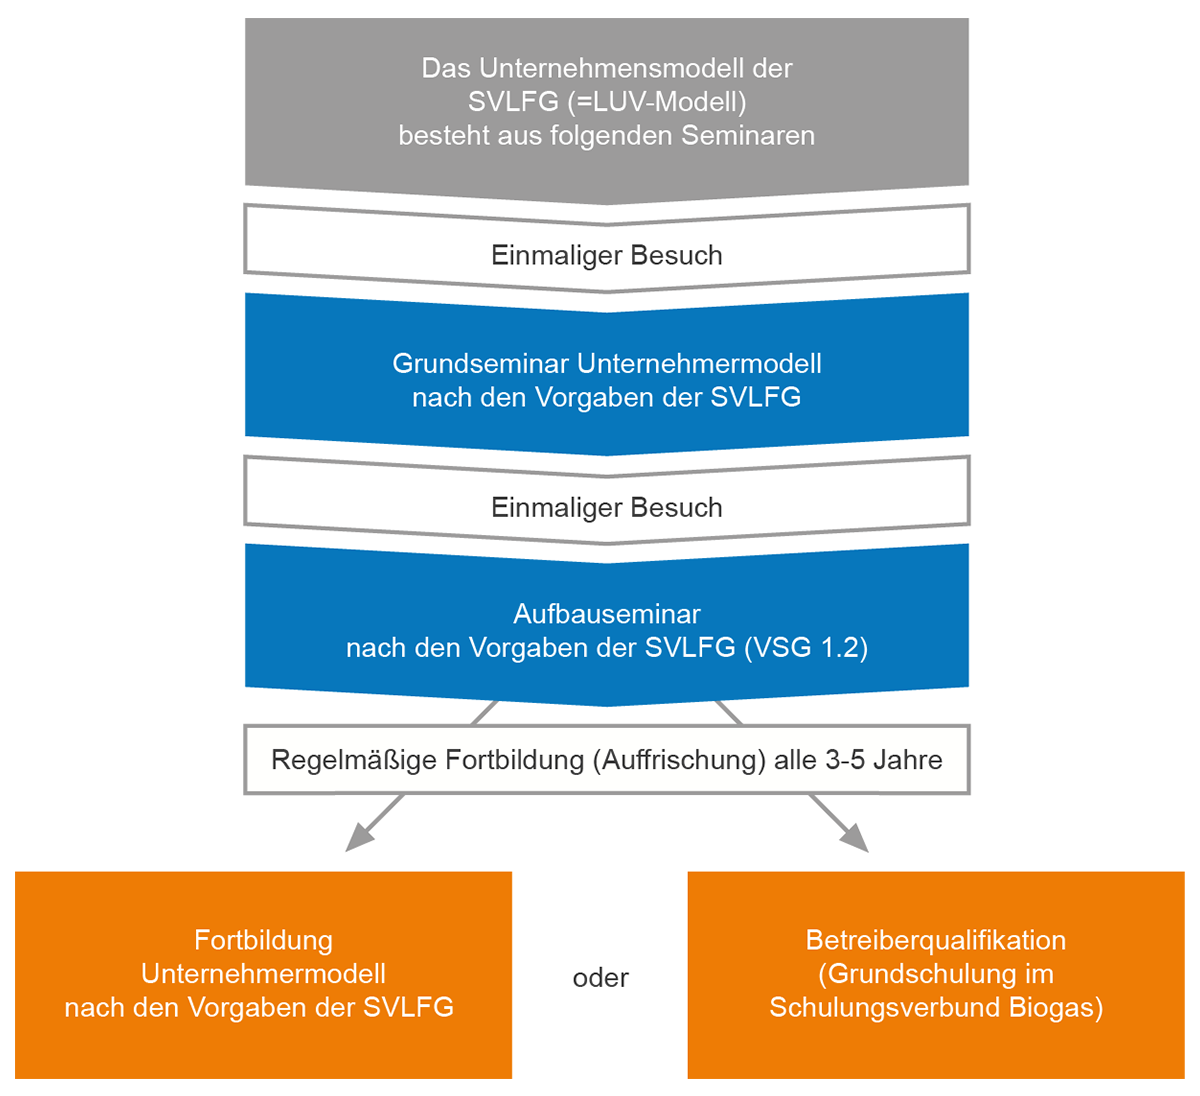 infografik-unternehmermodell-svlfg